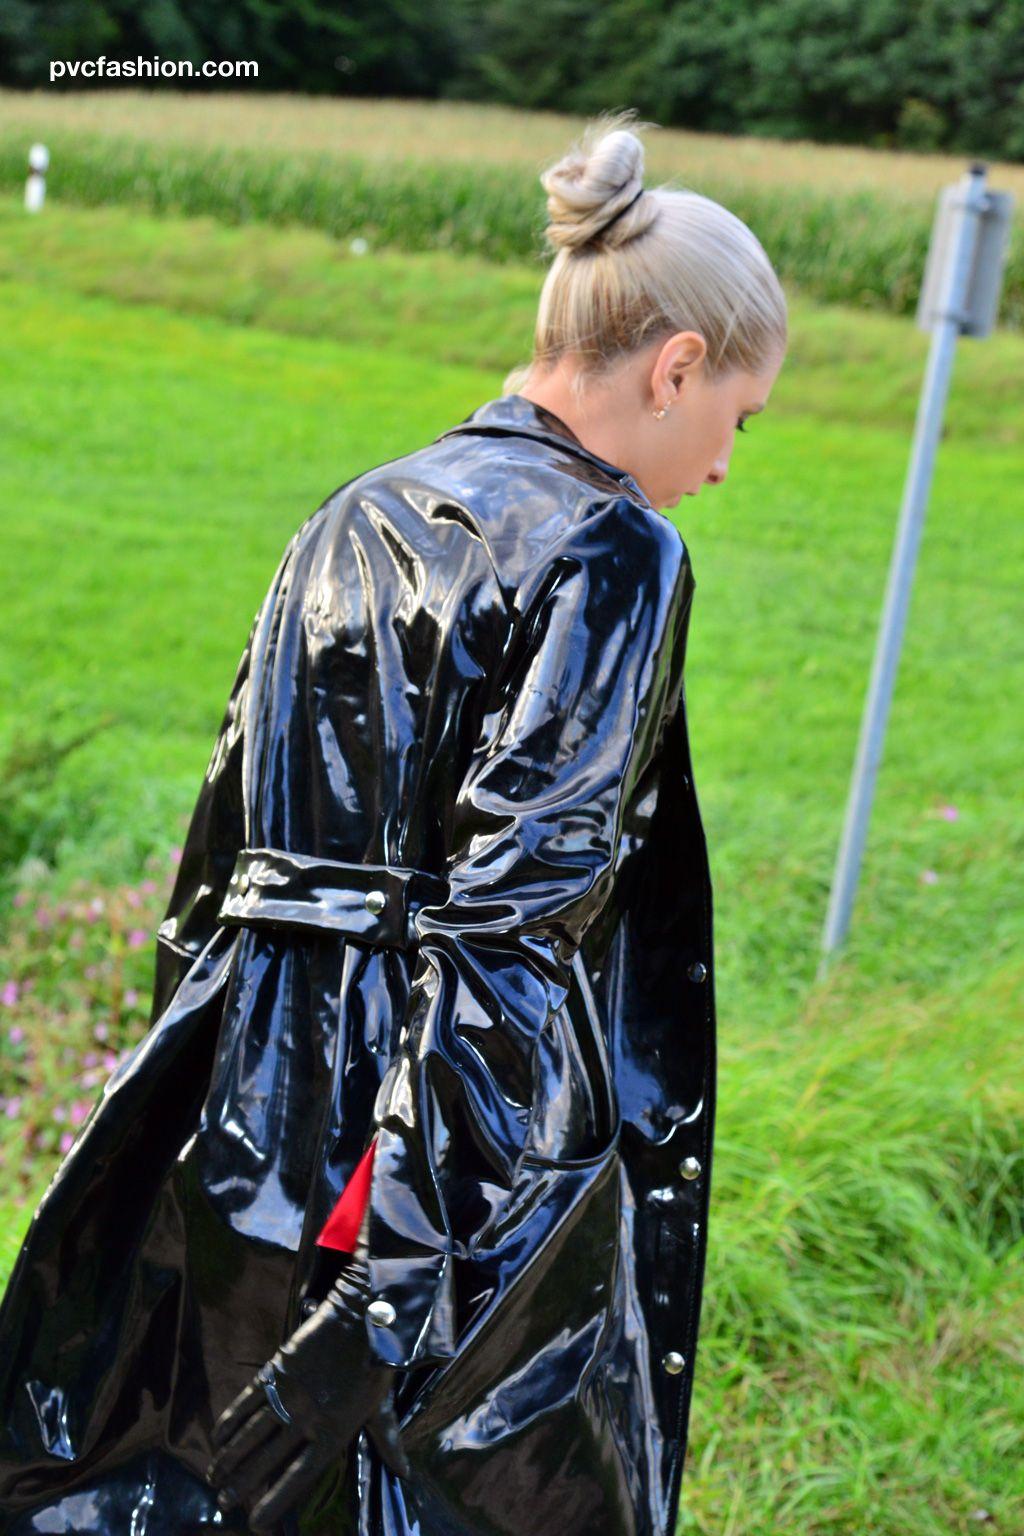 Caught In PVC rainwear by KEMO Cyberfashion, two tone PVC